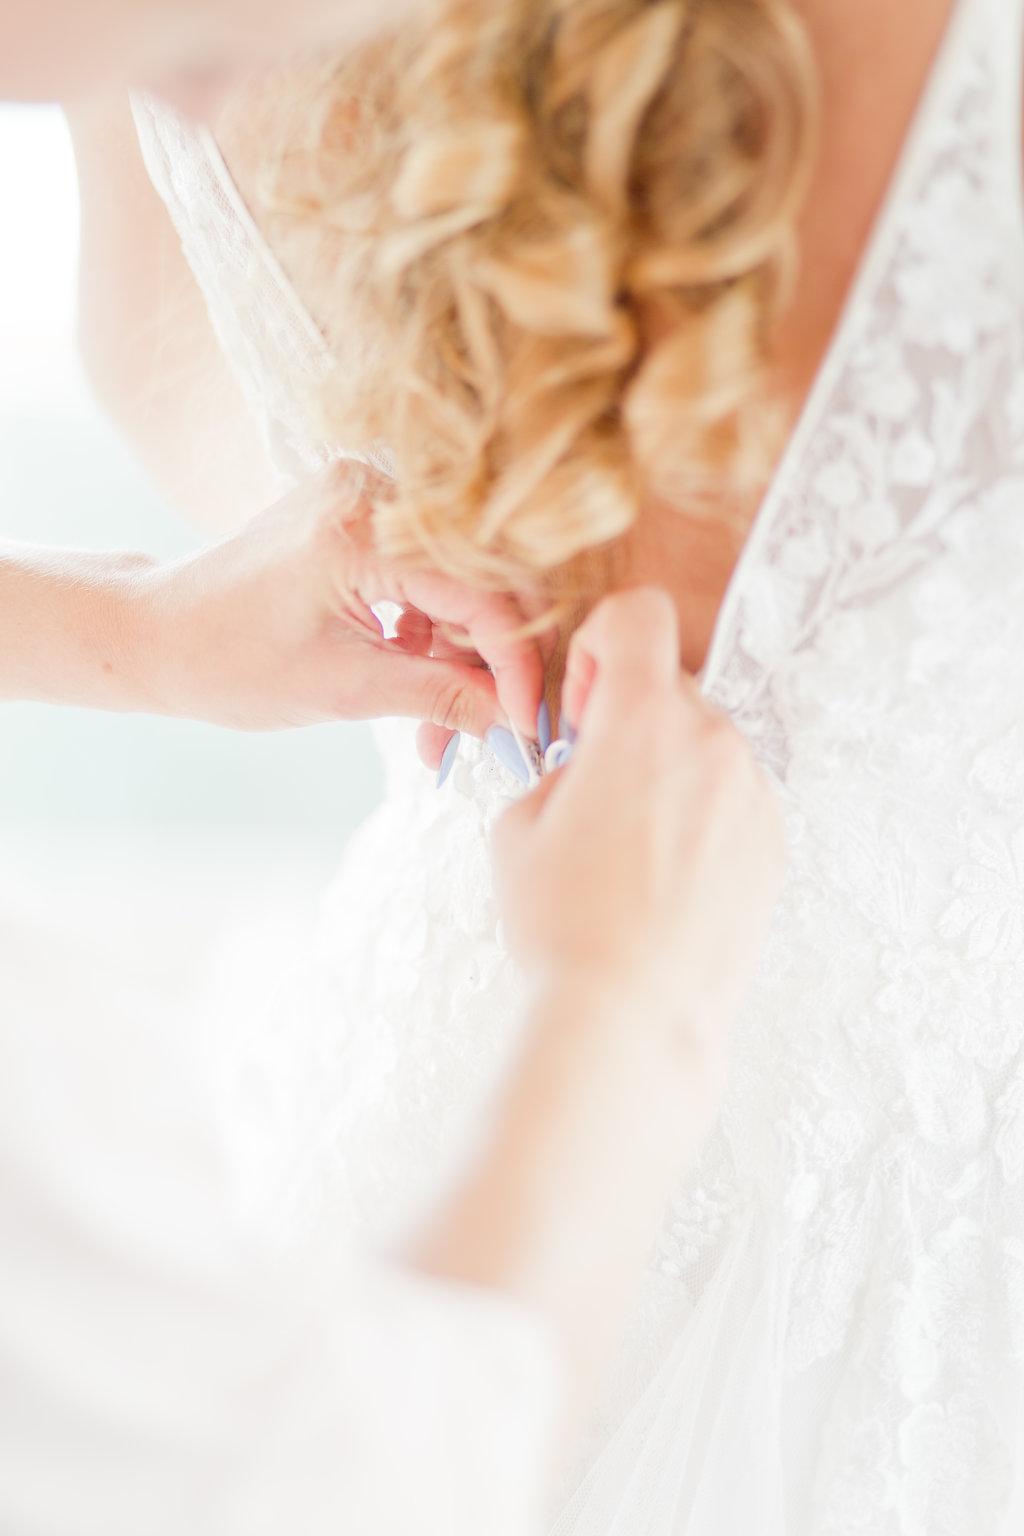 le coeur dans les etoiles - wedding planner - provence - sardaigne - shooting inspiration - mariage voilier - audrey carnoy - habillage mariee 2